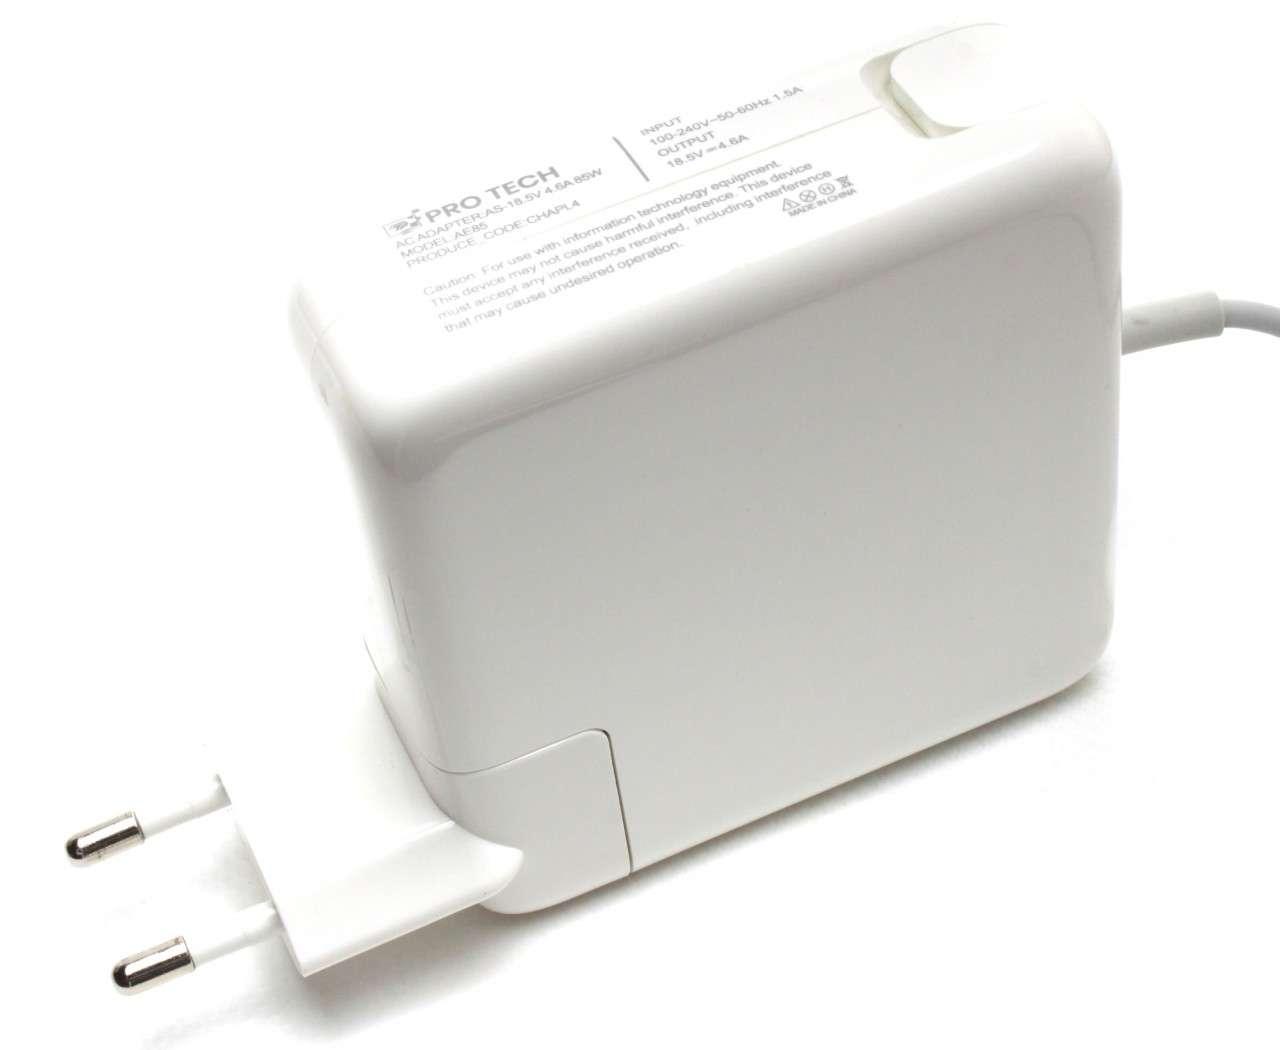 Incarcator Apple MacBook Pro A1226 85W Replacement imagine powerlaptop.ro 2021